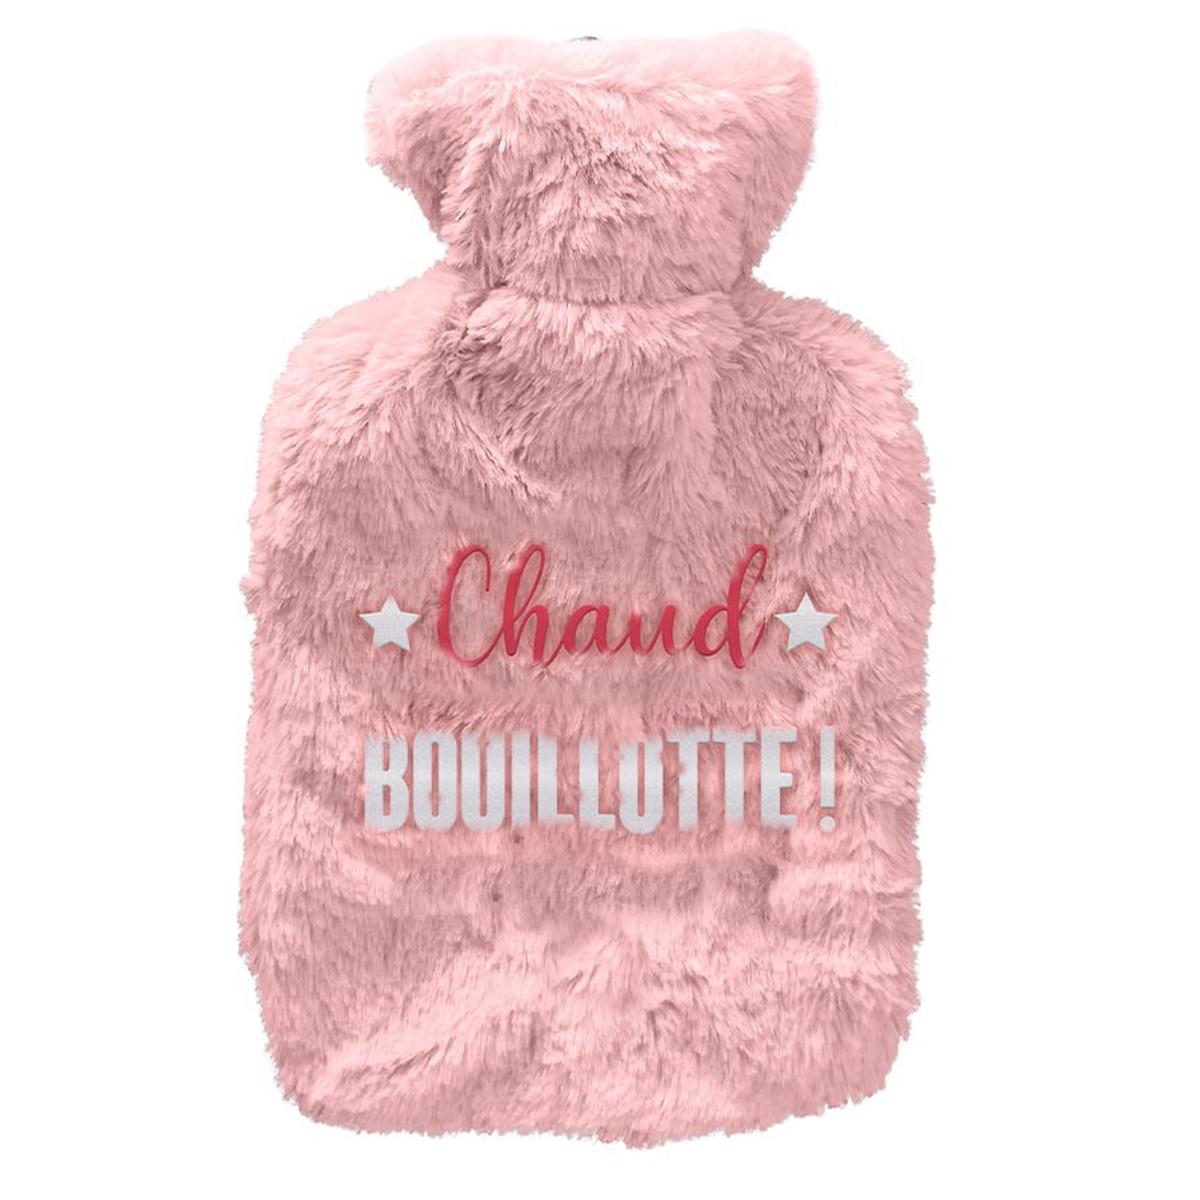 Bouillotte fourrure \'Chaud Bouillotte !\' rose - 27x16 (1L) - [A3012]